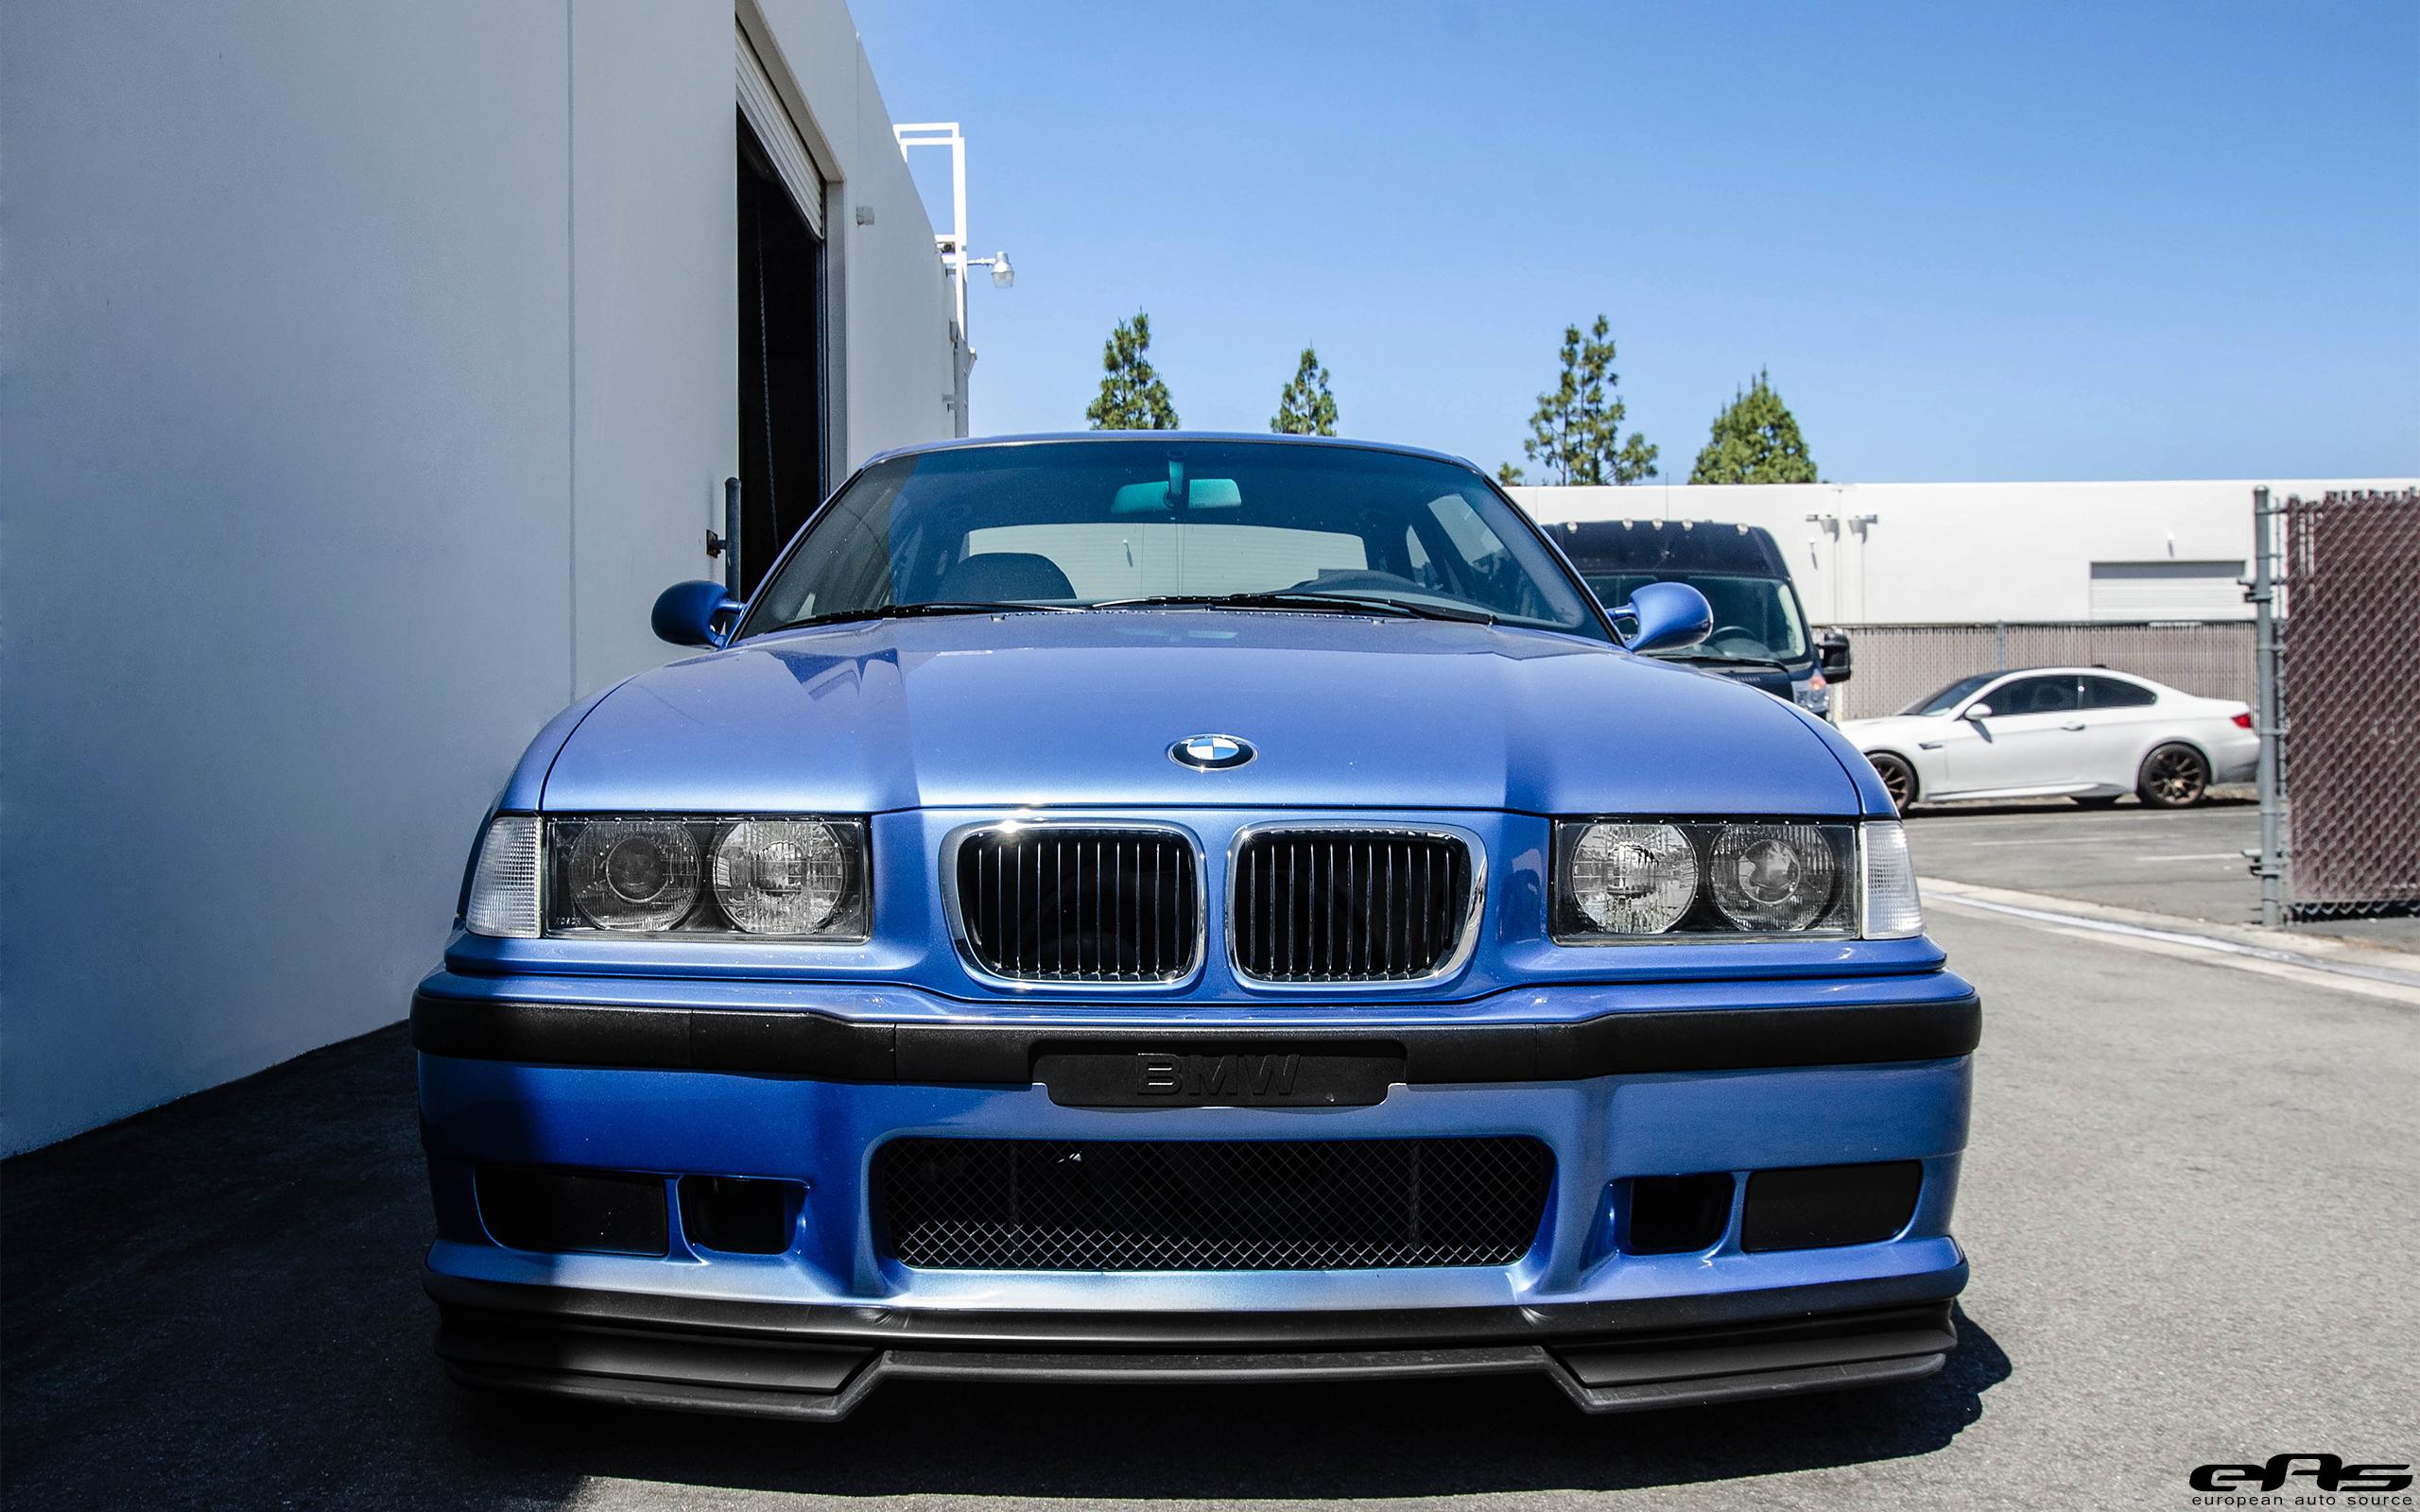 Interlagos Blue E46 M3 >> 1997 Estoril Blue E36 M3 | BMW Performance Parts & Services